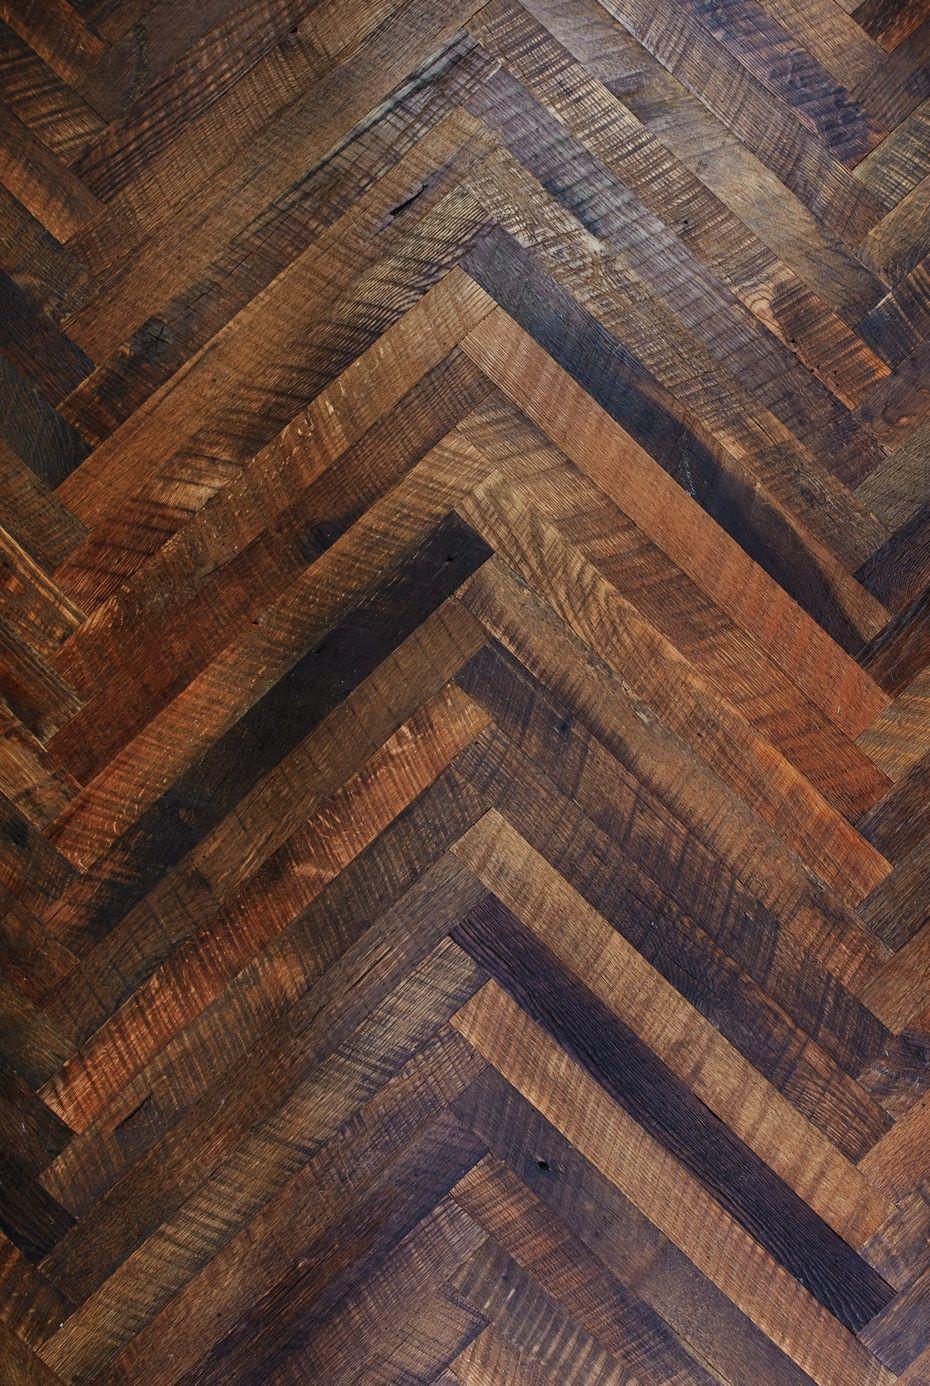 dark hardwood floor pattern.  Hardwood Custom Herringbone Wooden Floors And Dark Hardwood Floor Pattern R